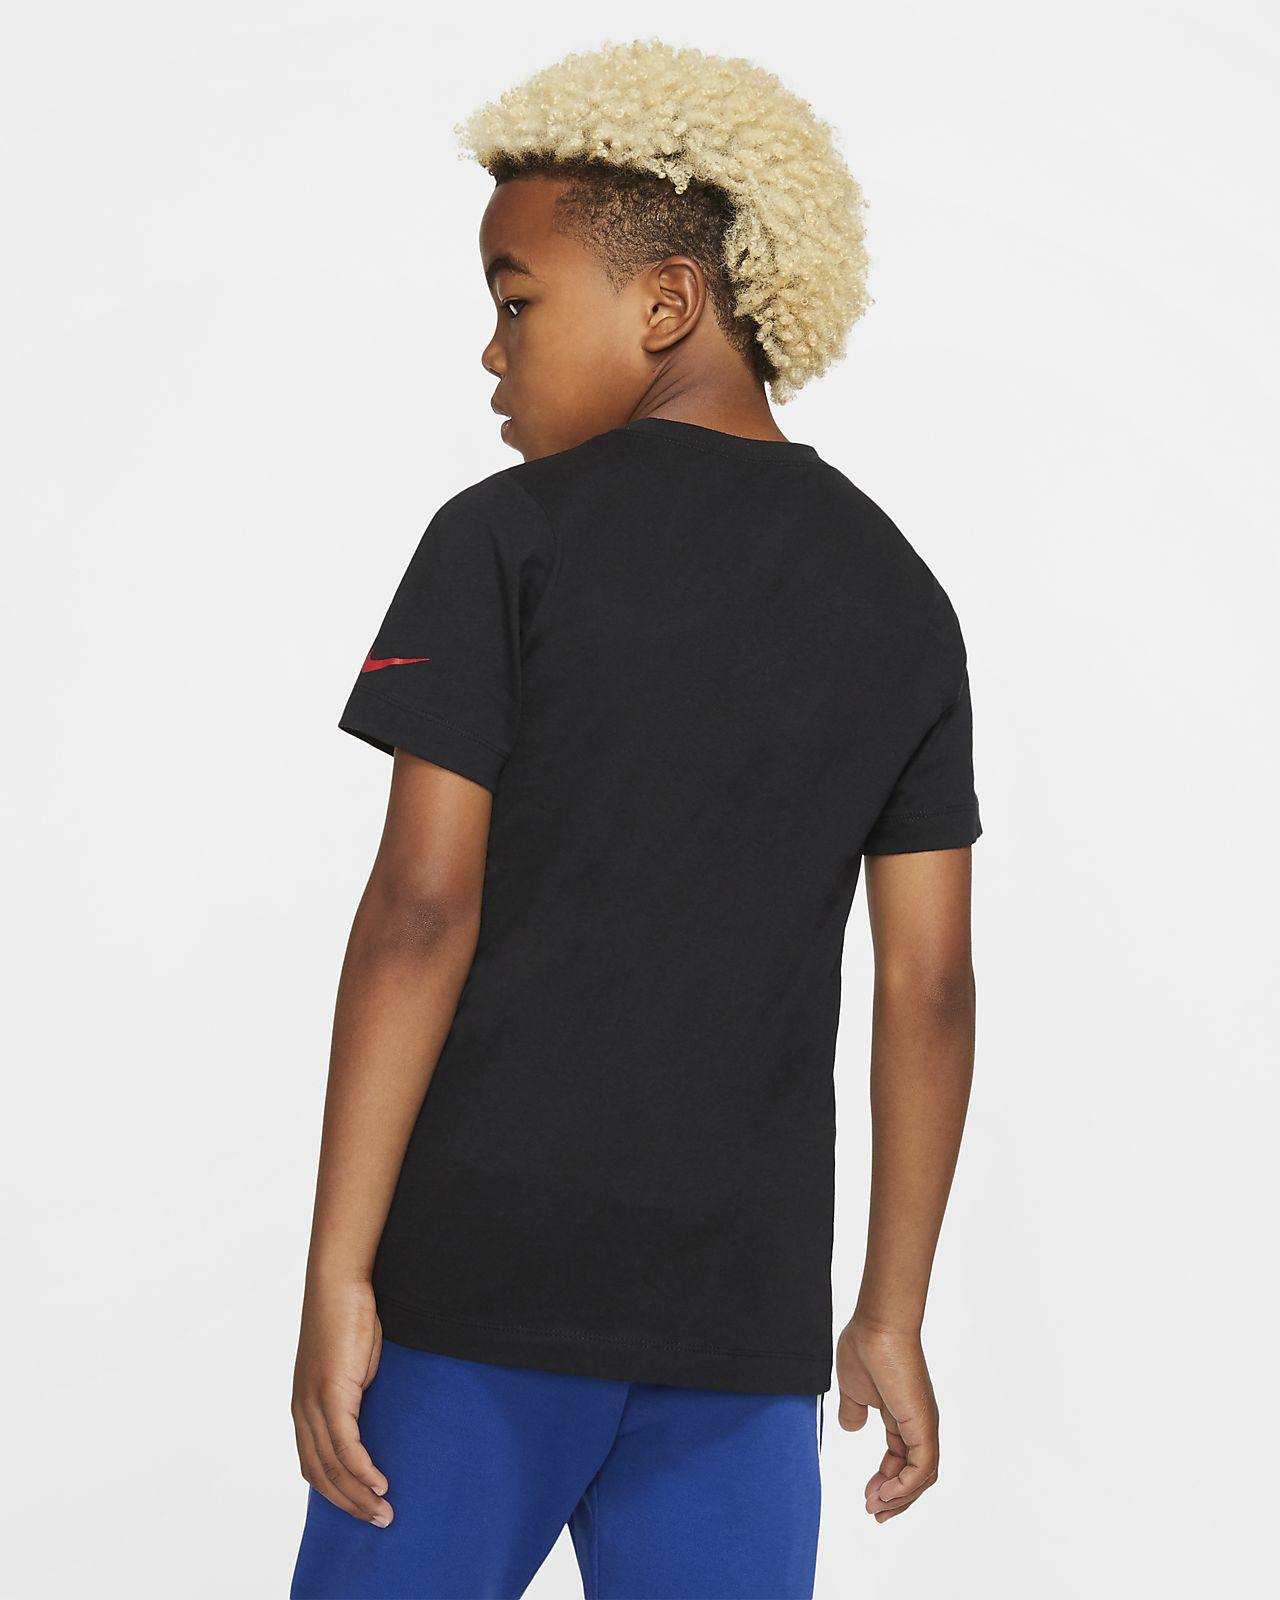 a147ef8f3 Nike Sportswear Older Kids' JDI T-Shirt. Nike.com SG